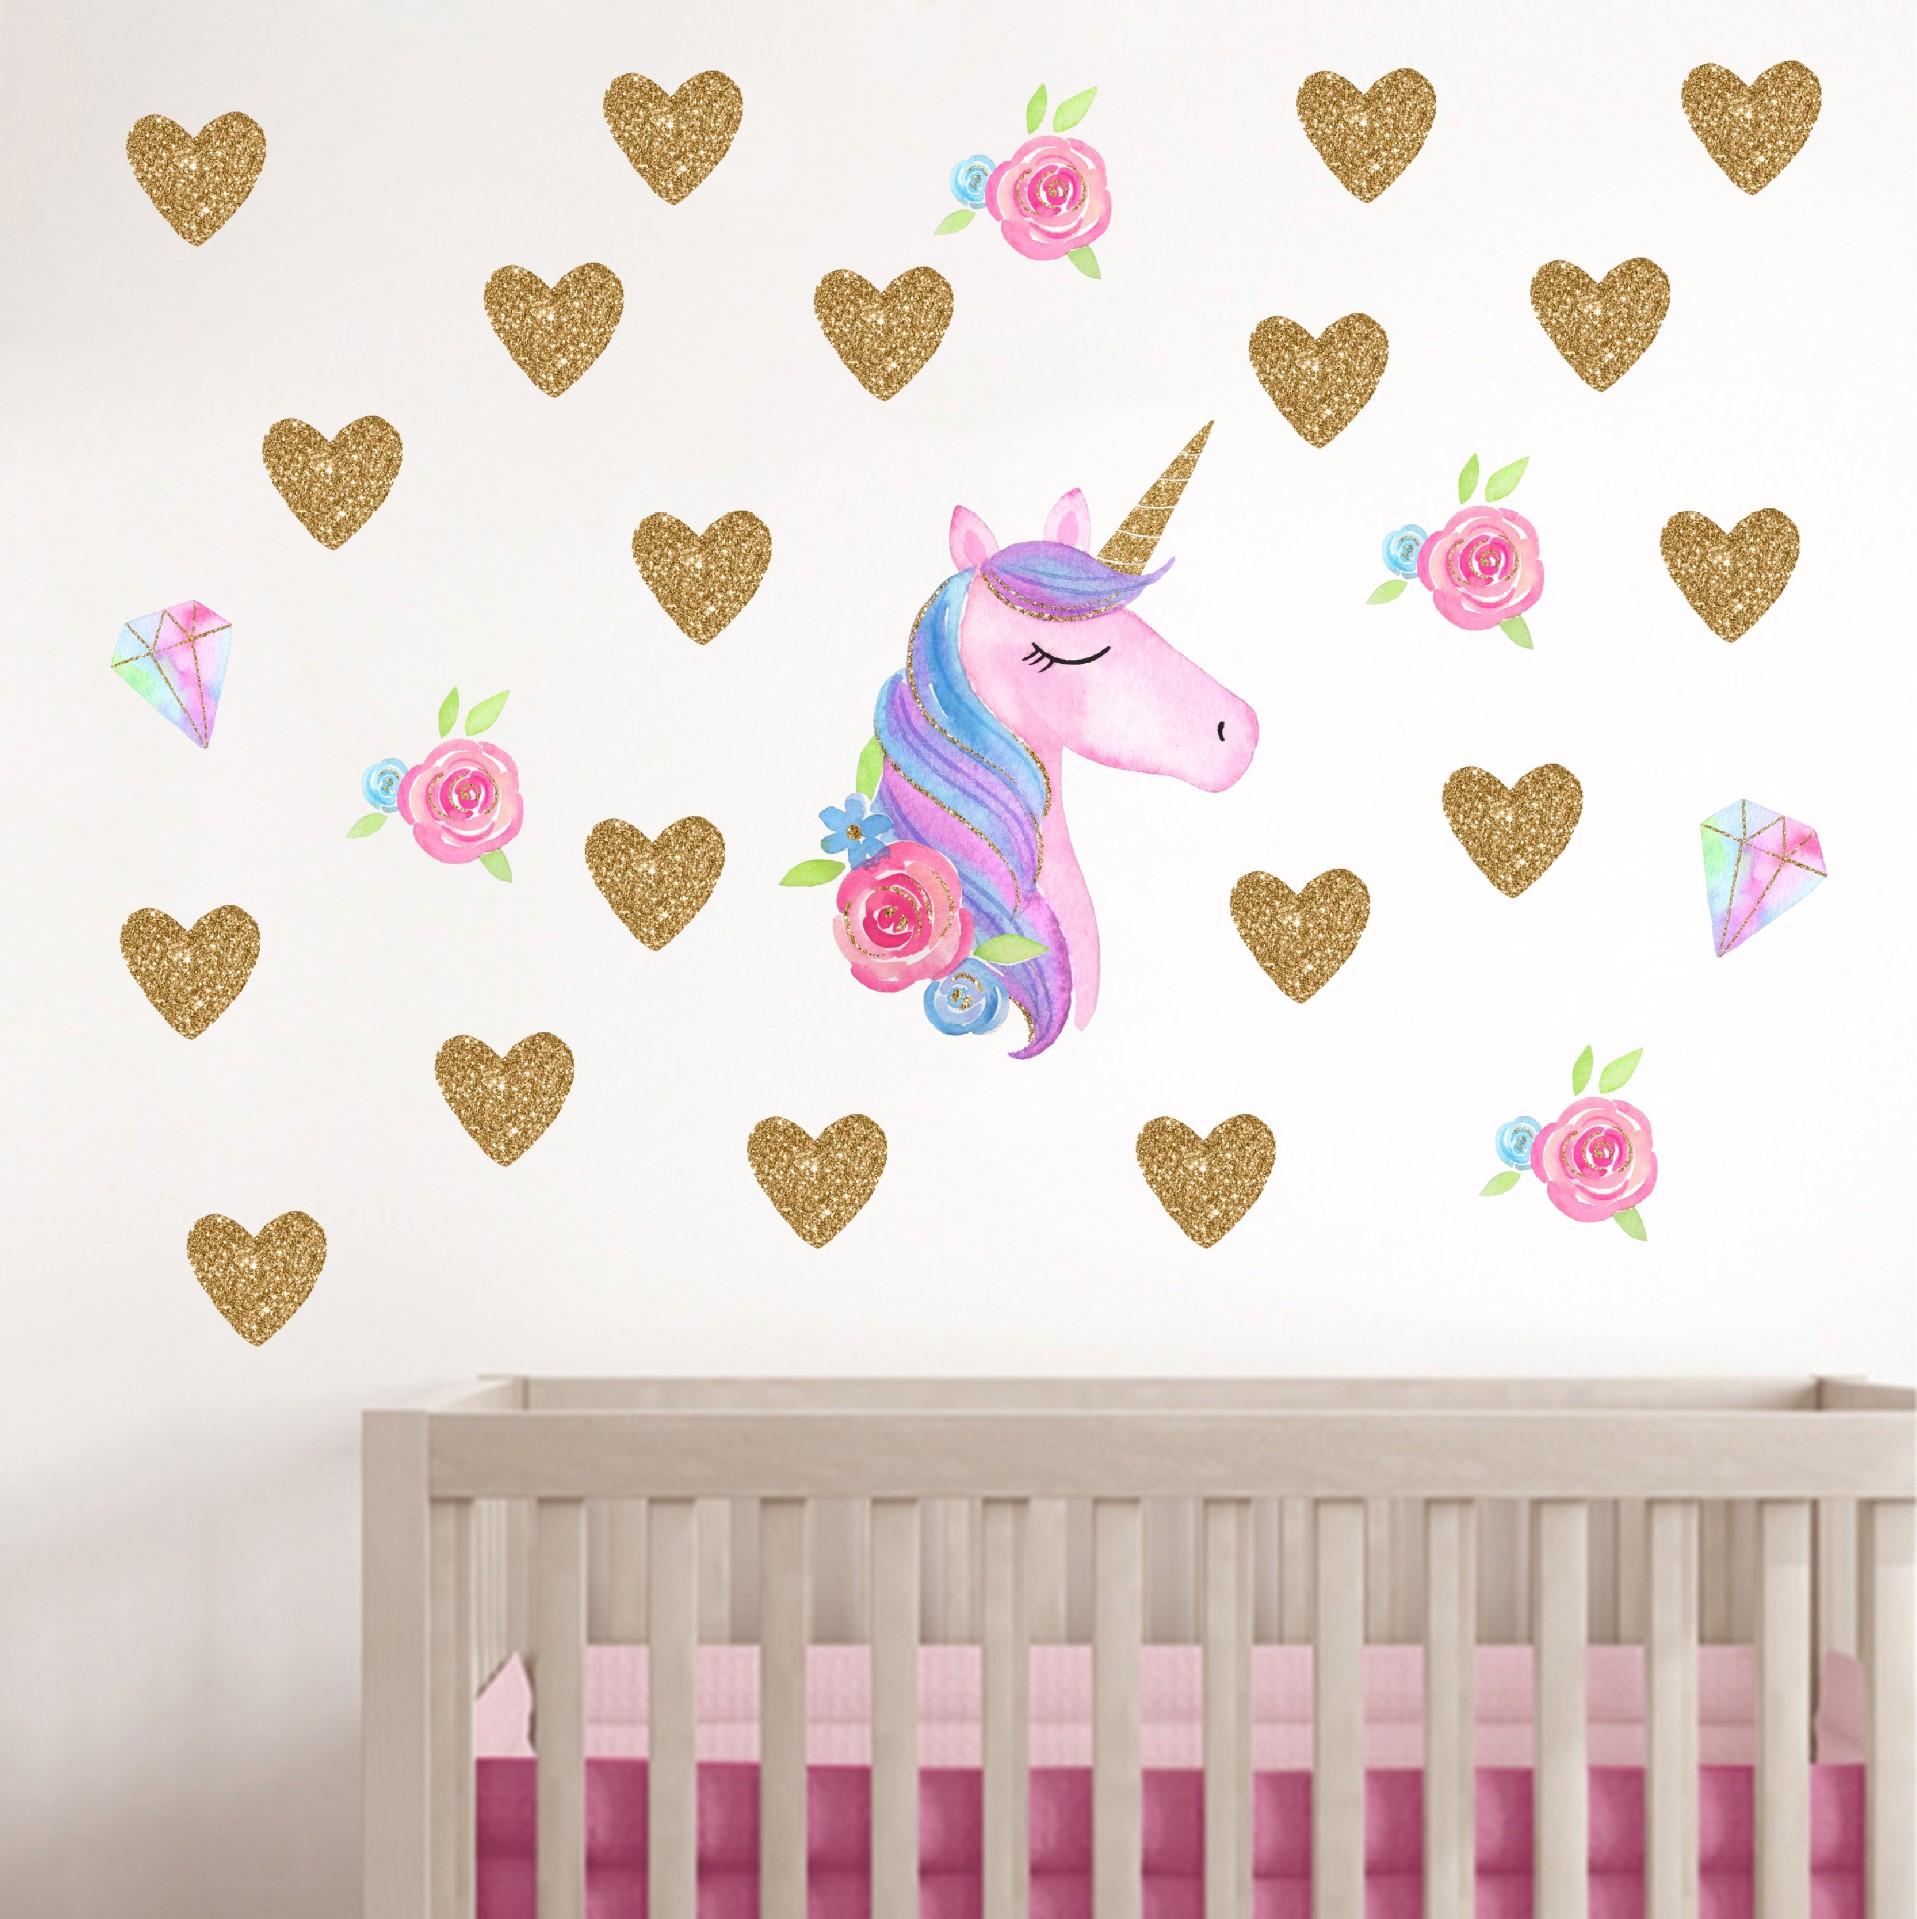 Diy Stars Flower Animals Vinyl Home Wall Decals Kids Room Girls Room Decor 1pc Cartoon Unicorns Flower Wall Stickers